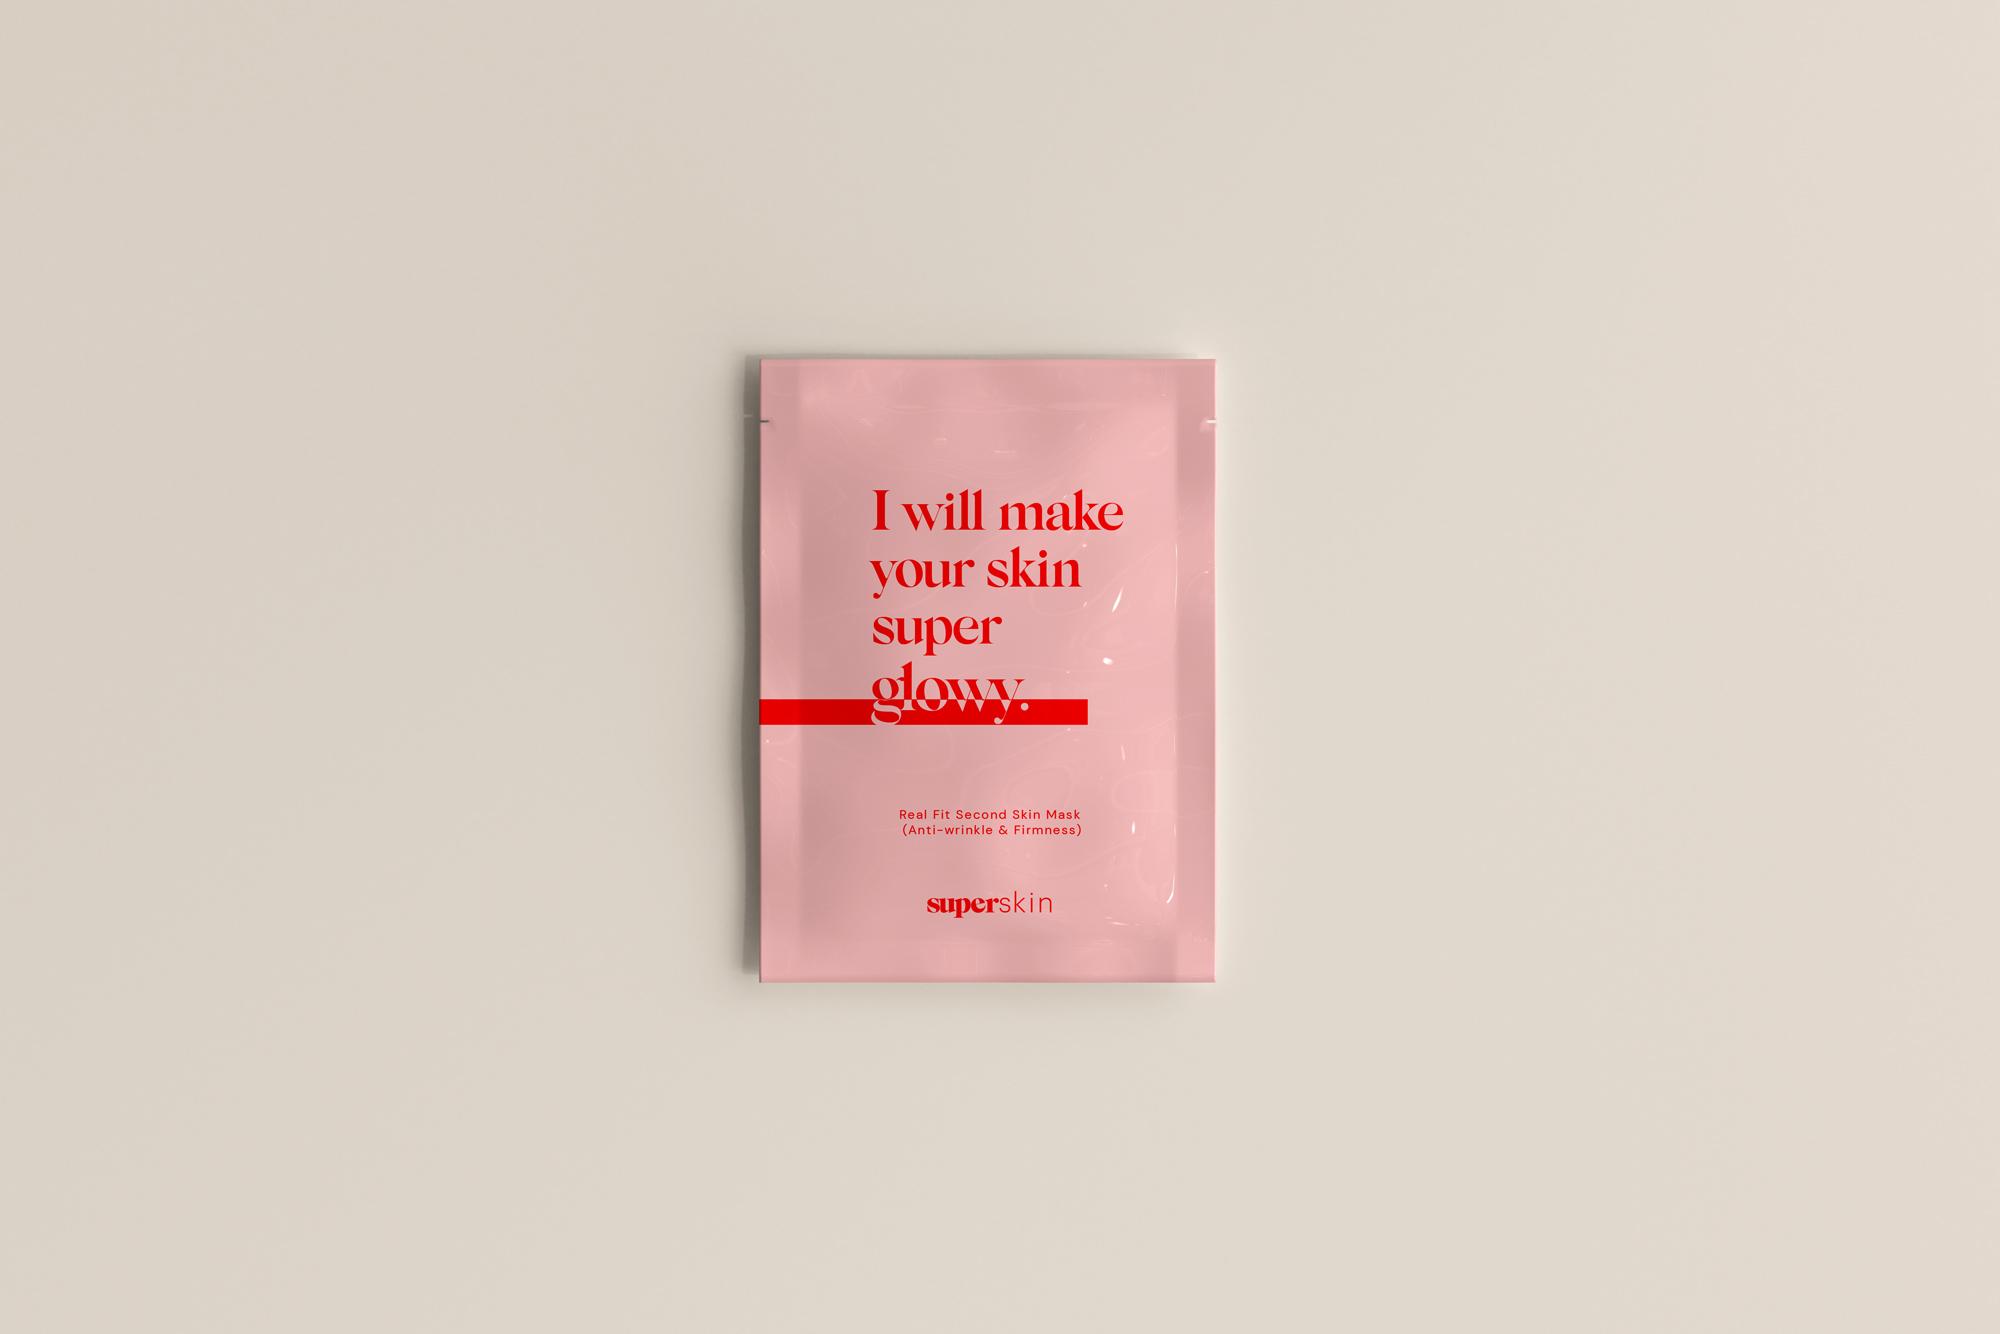 superskin-skincare-branding-packaging